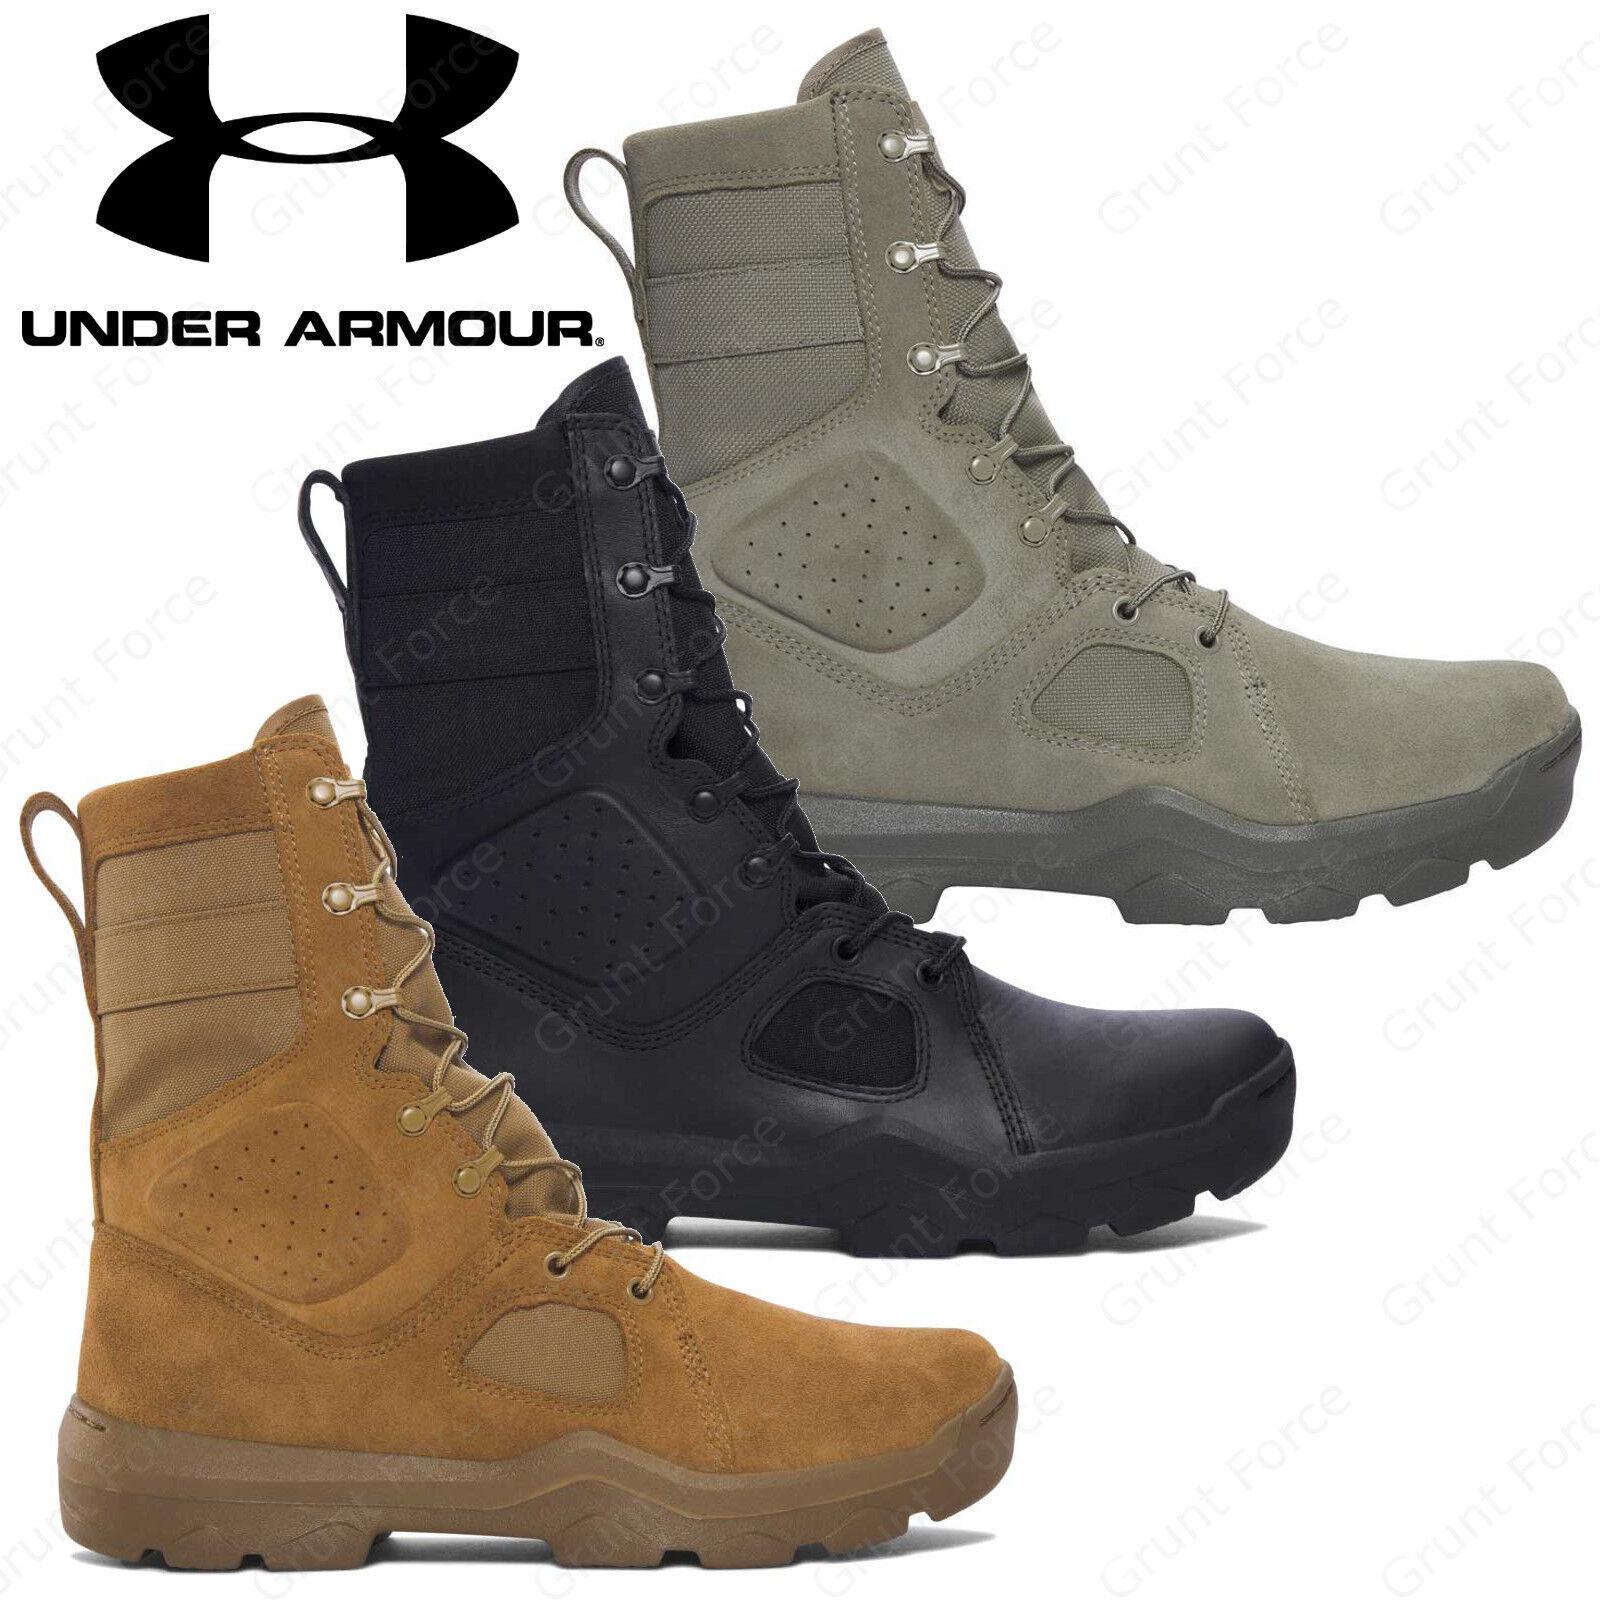 Under Armour Men's Tactical Boots - UA FNP Style 1287352